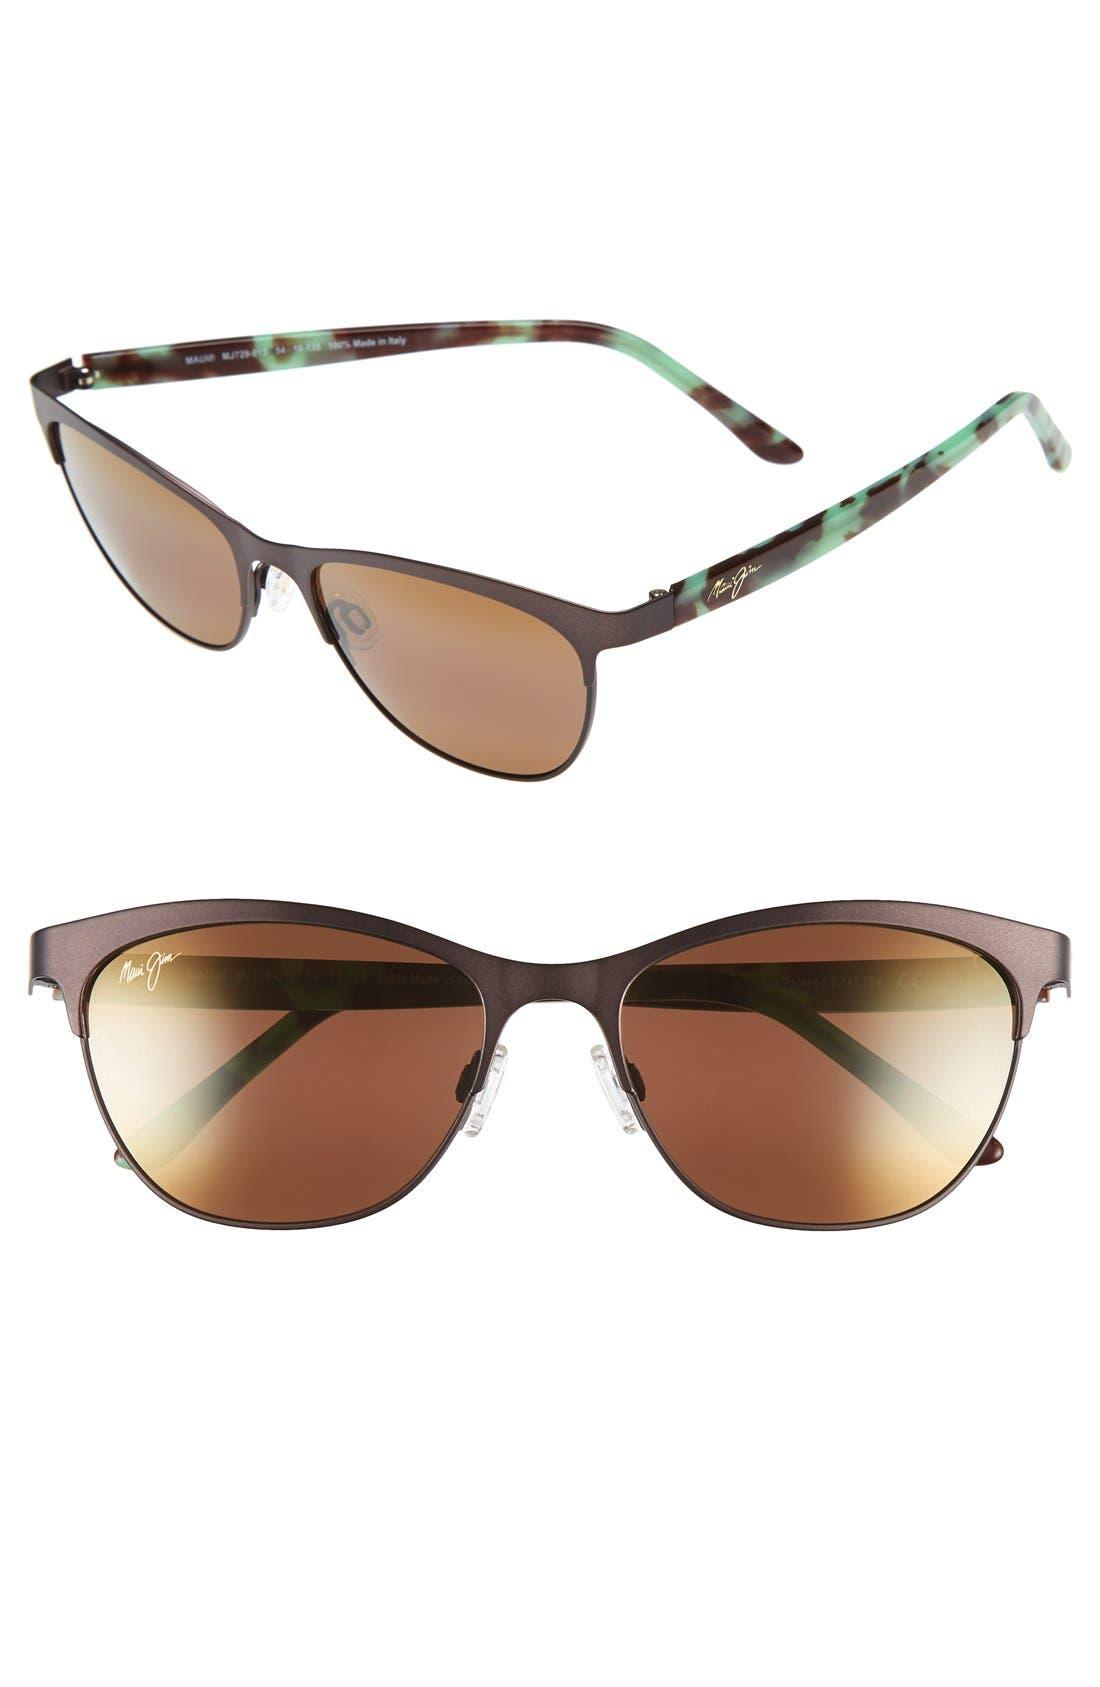 Popoki 54mm PolarizedPlus2<sup>®</sup> Sunglasses,                         Main,                         color, Satin Chocolate/ Hcl Bronze